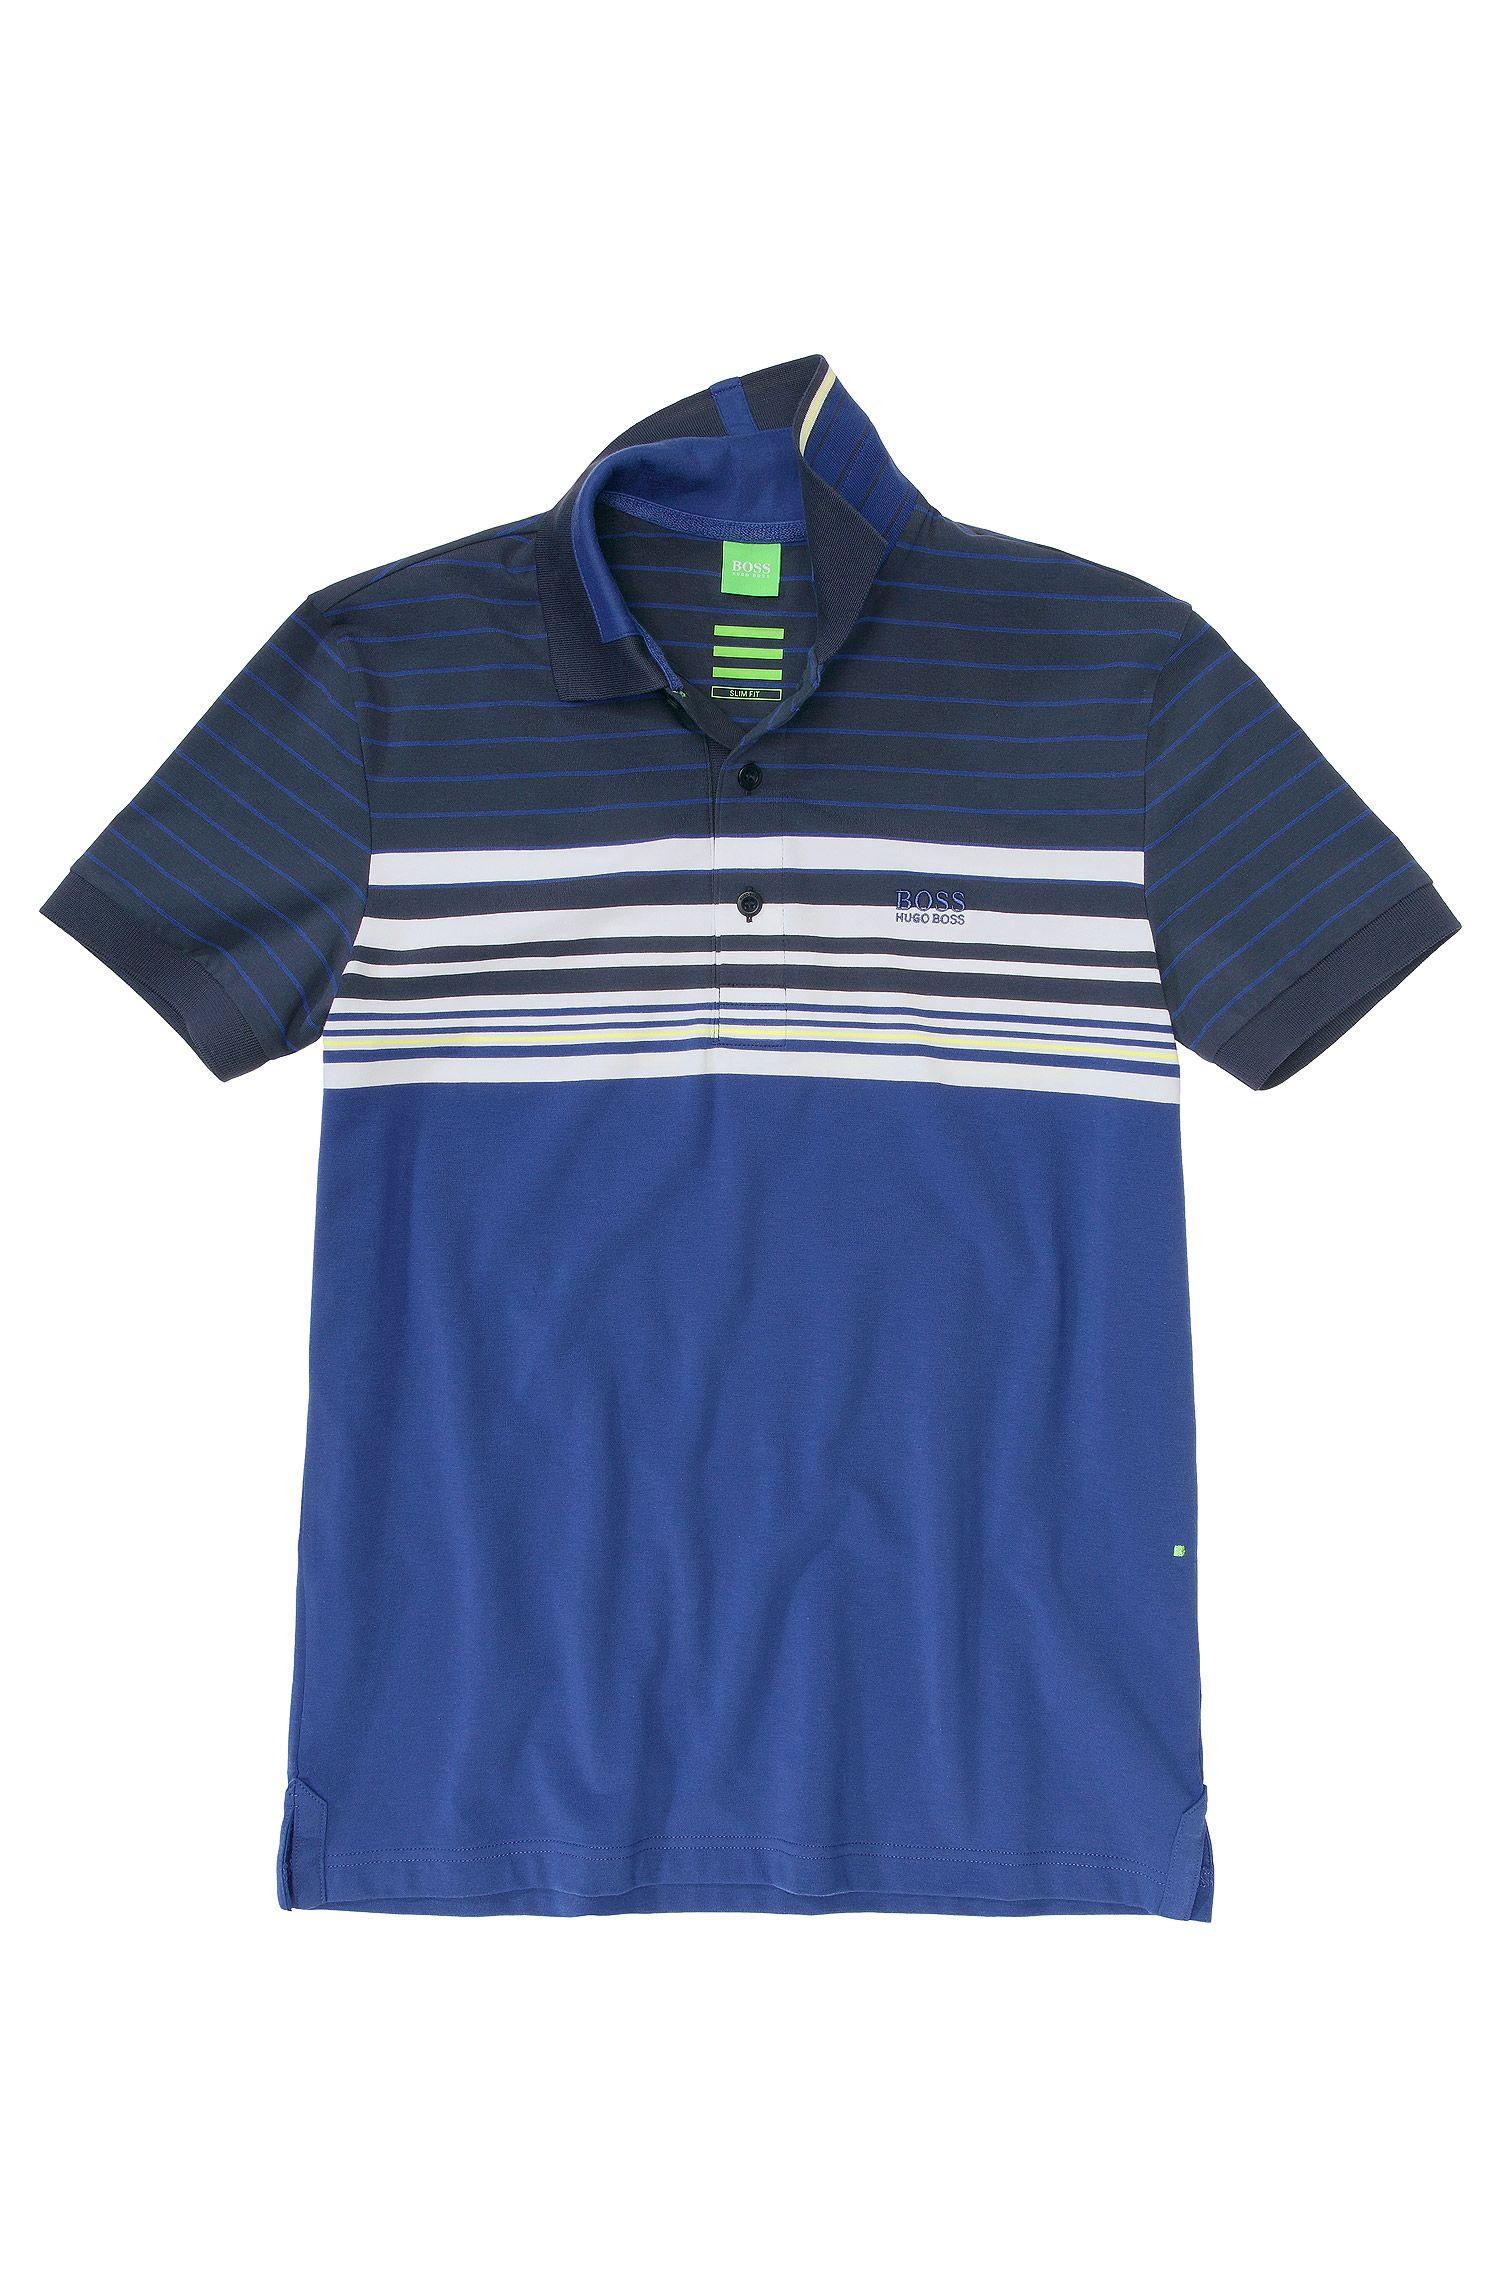 Polo en jersey de coton, Paule 1